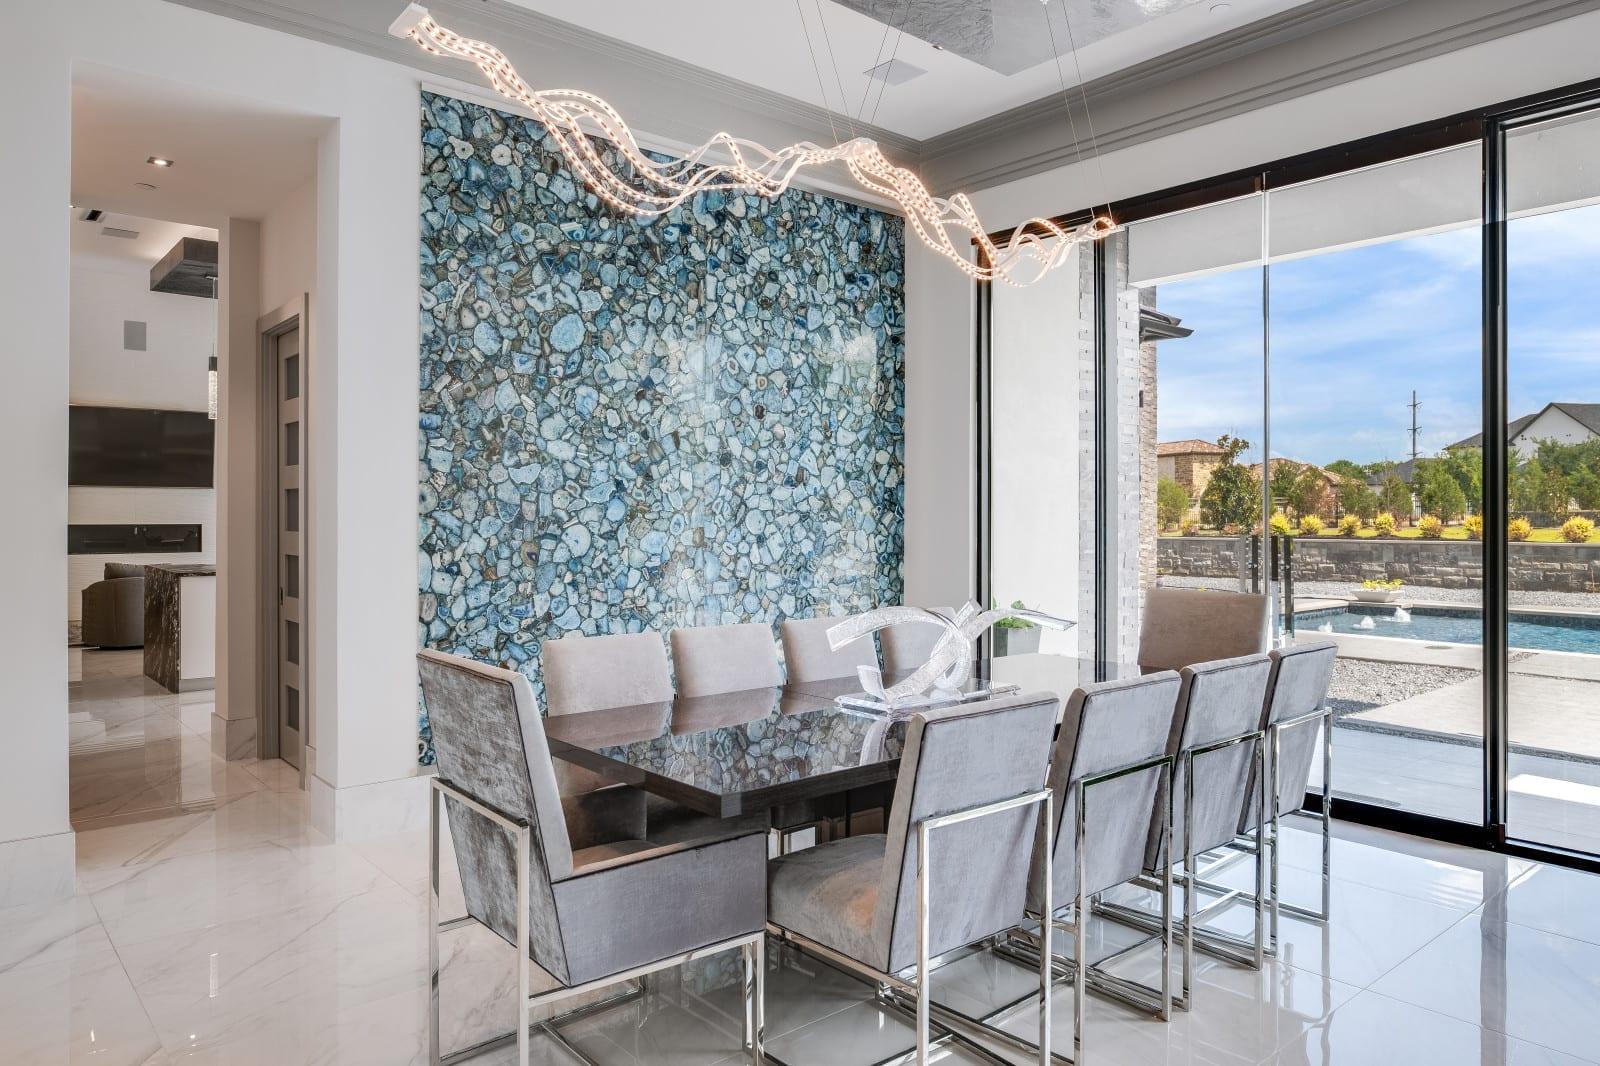 Custom Home Build and Interior Design # 36 - Millennial Design + Build, Home Builders in Dallas Texas, modern style homes, and custom home builders in DFW